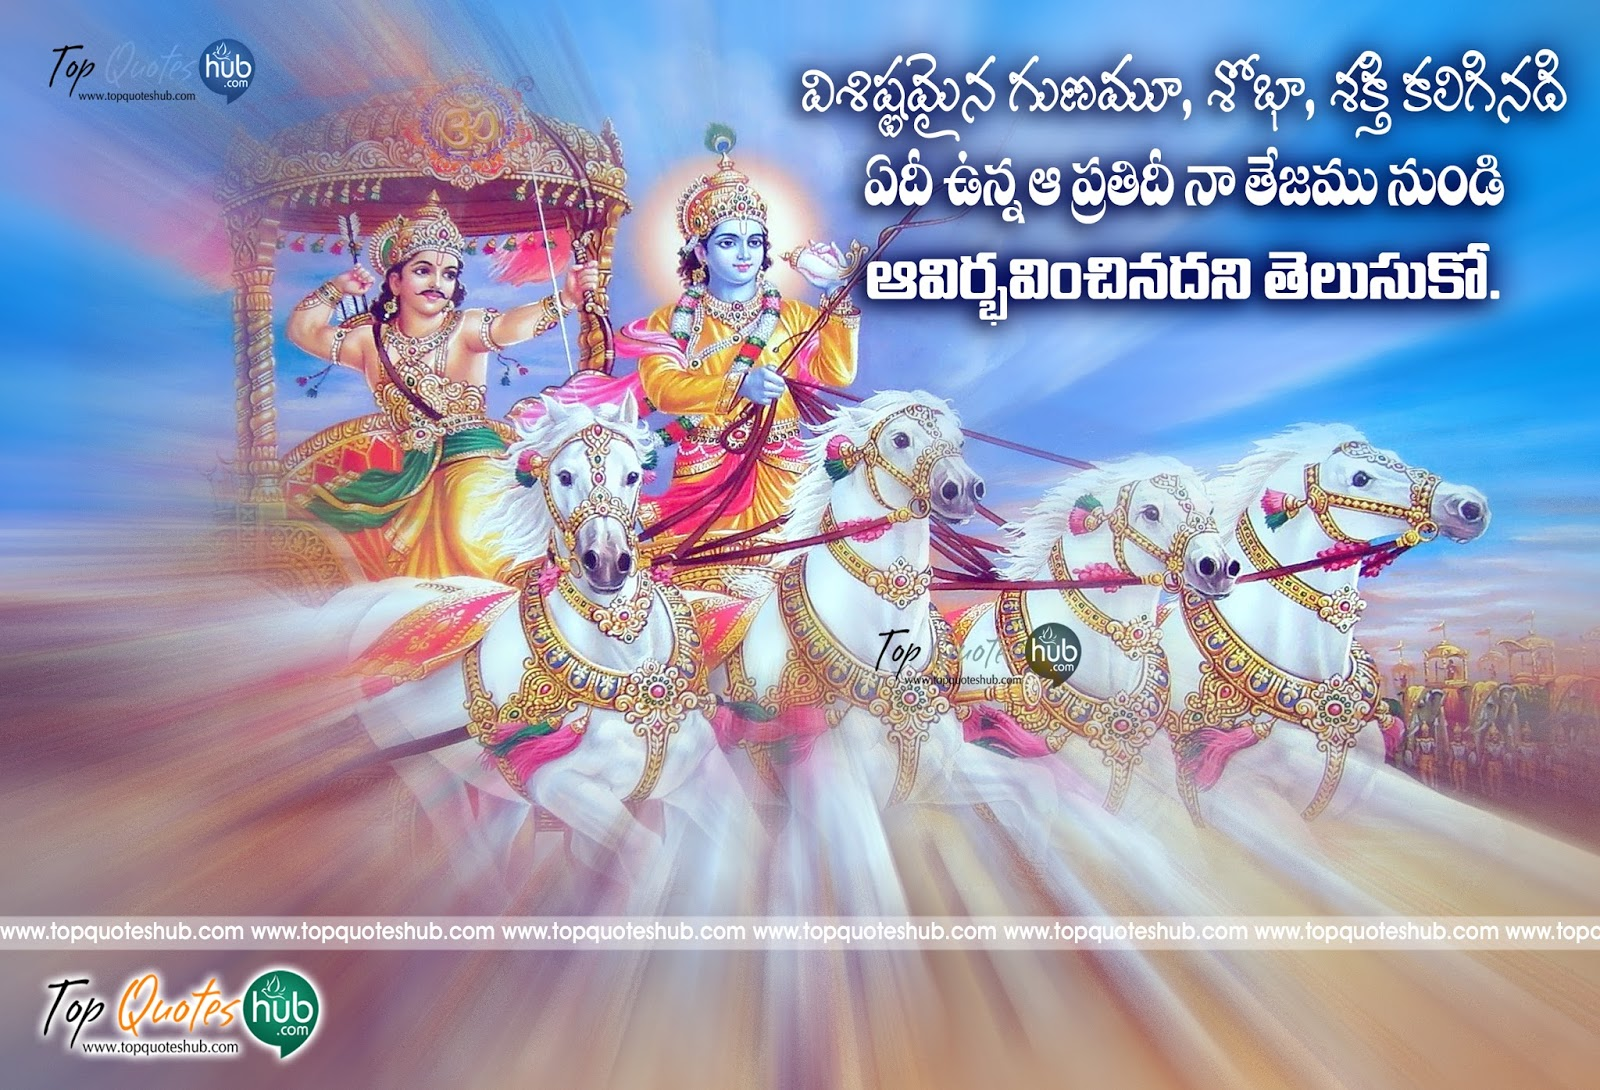 Bhagavad Gita Wallpapers Quotes In Tamil Bhagavad Gita Wallpapers